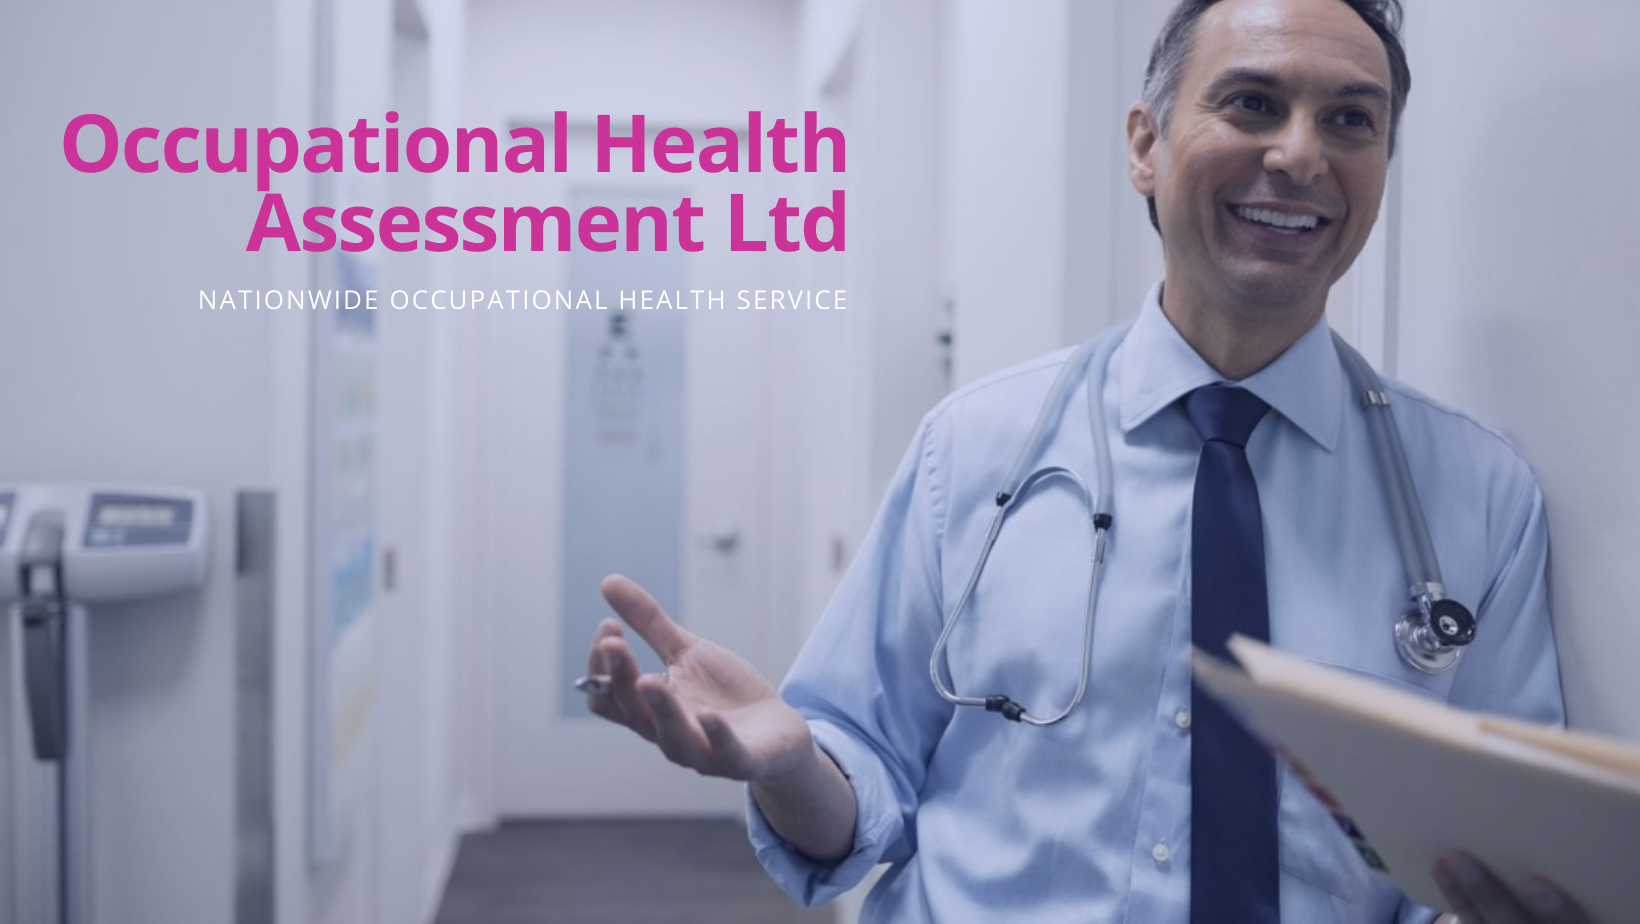 Occupational Health Assessment Ltd